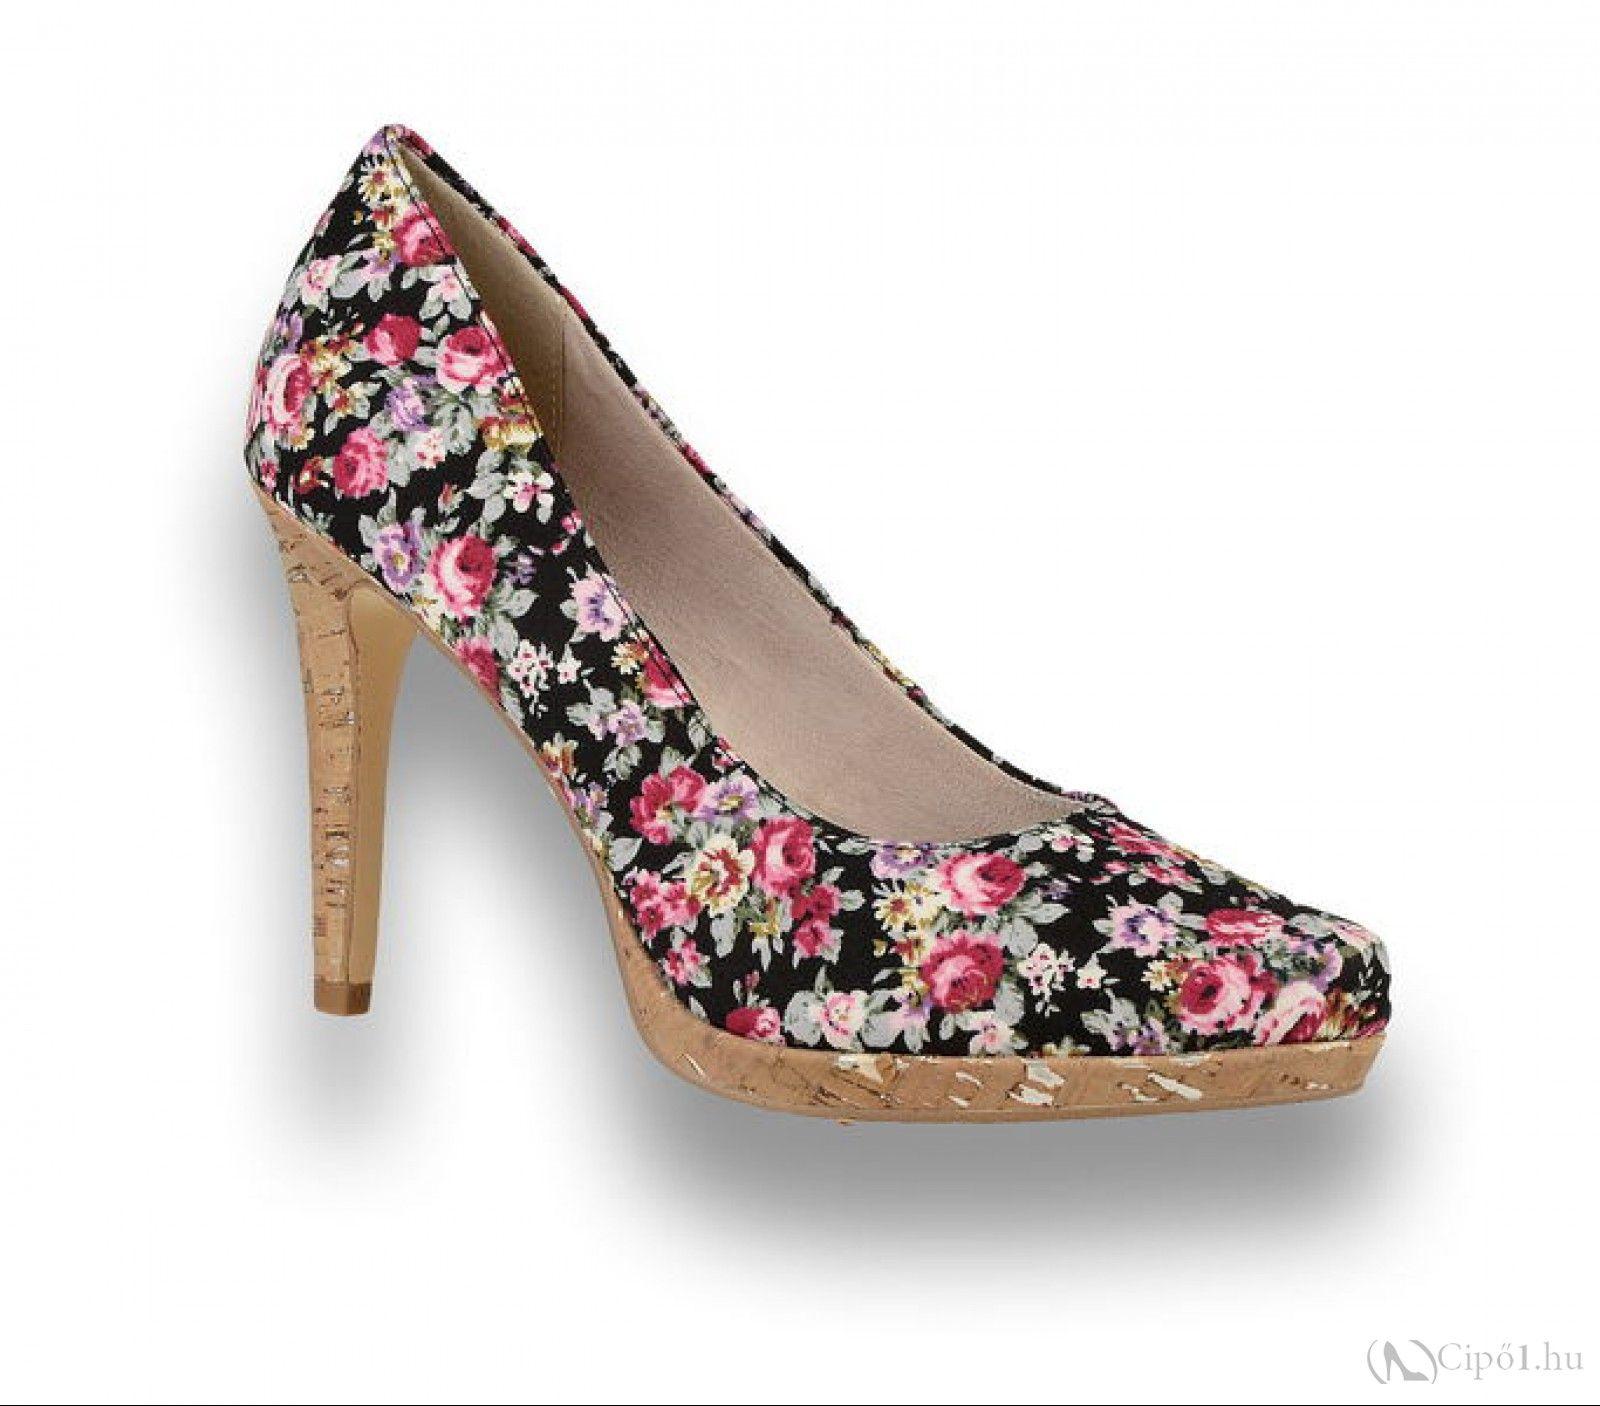 Tamaris Női cipő 1 22446 28 016 Tamaris virág színű női